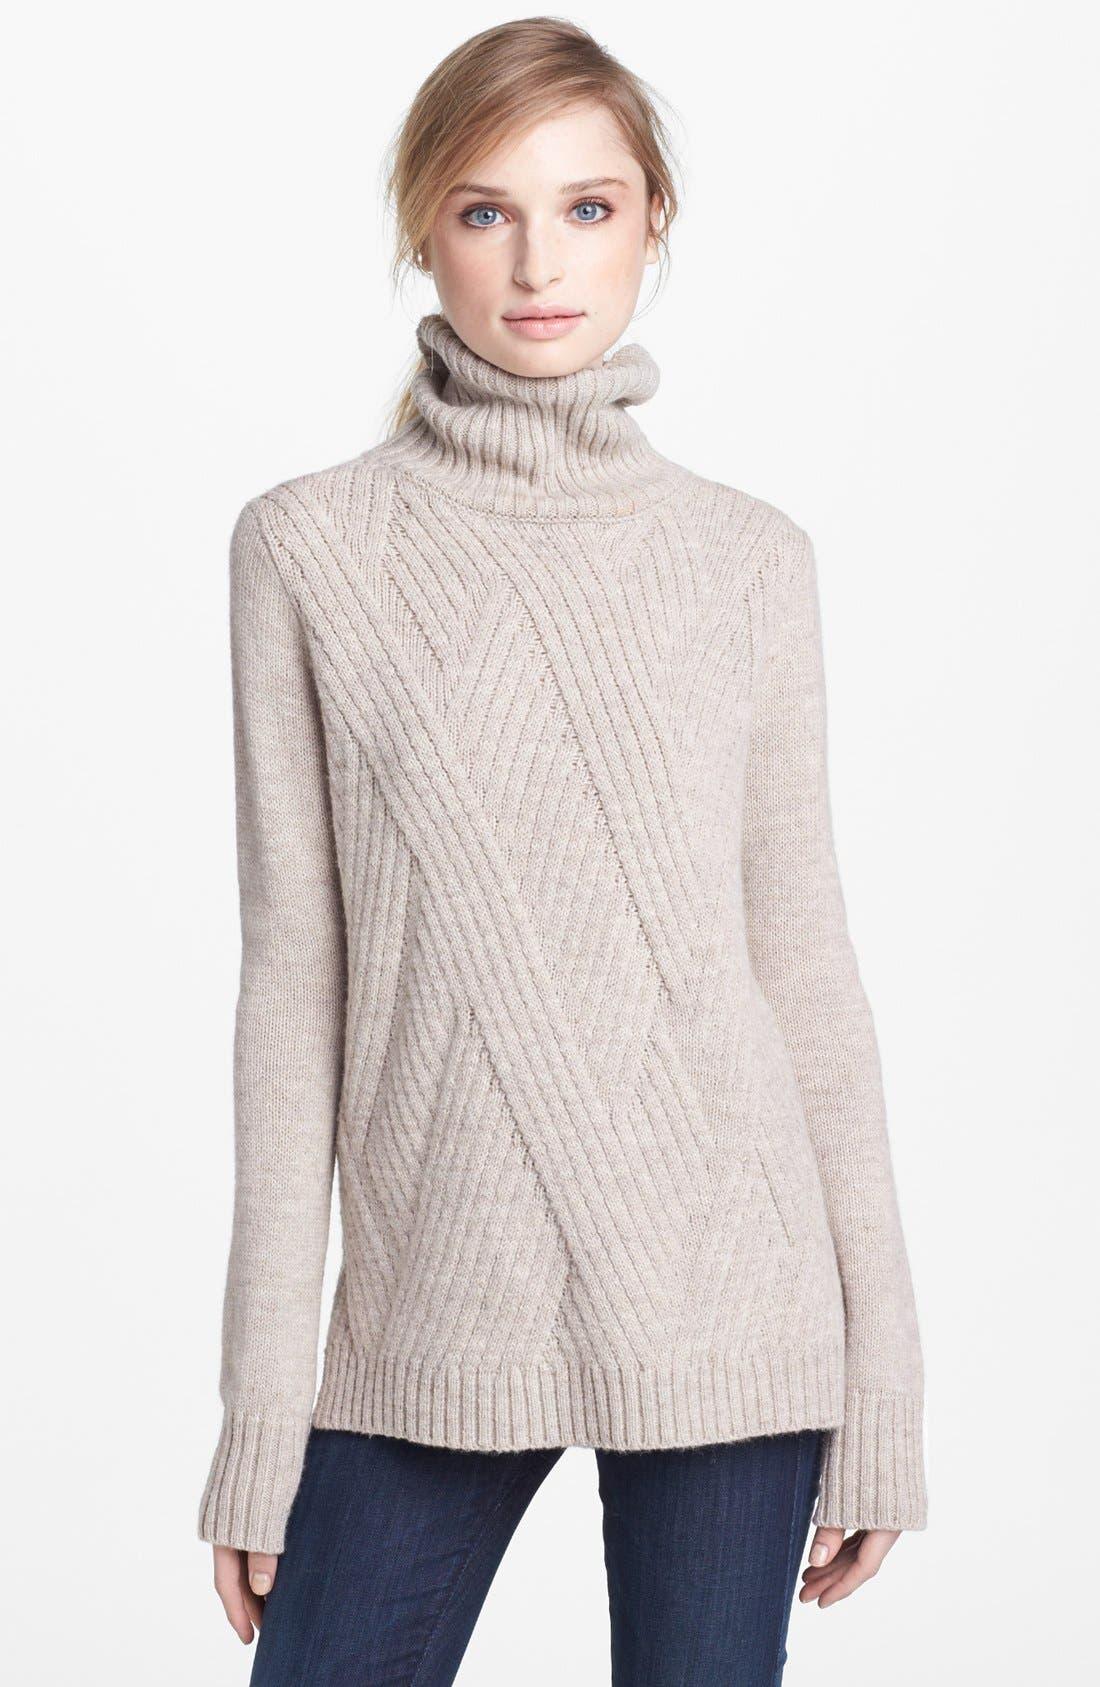 Alternate Image 1 Selected - Vince 'Travelling' Ribbed Turtleneck Sweater